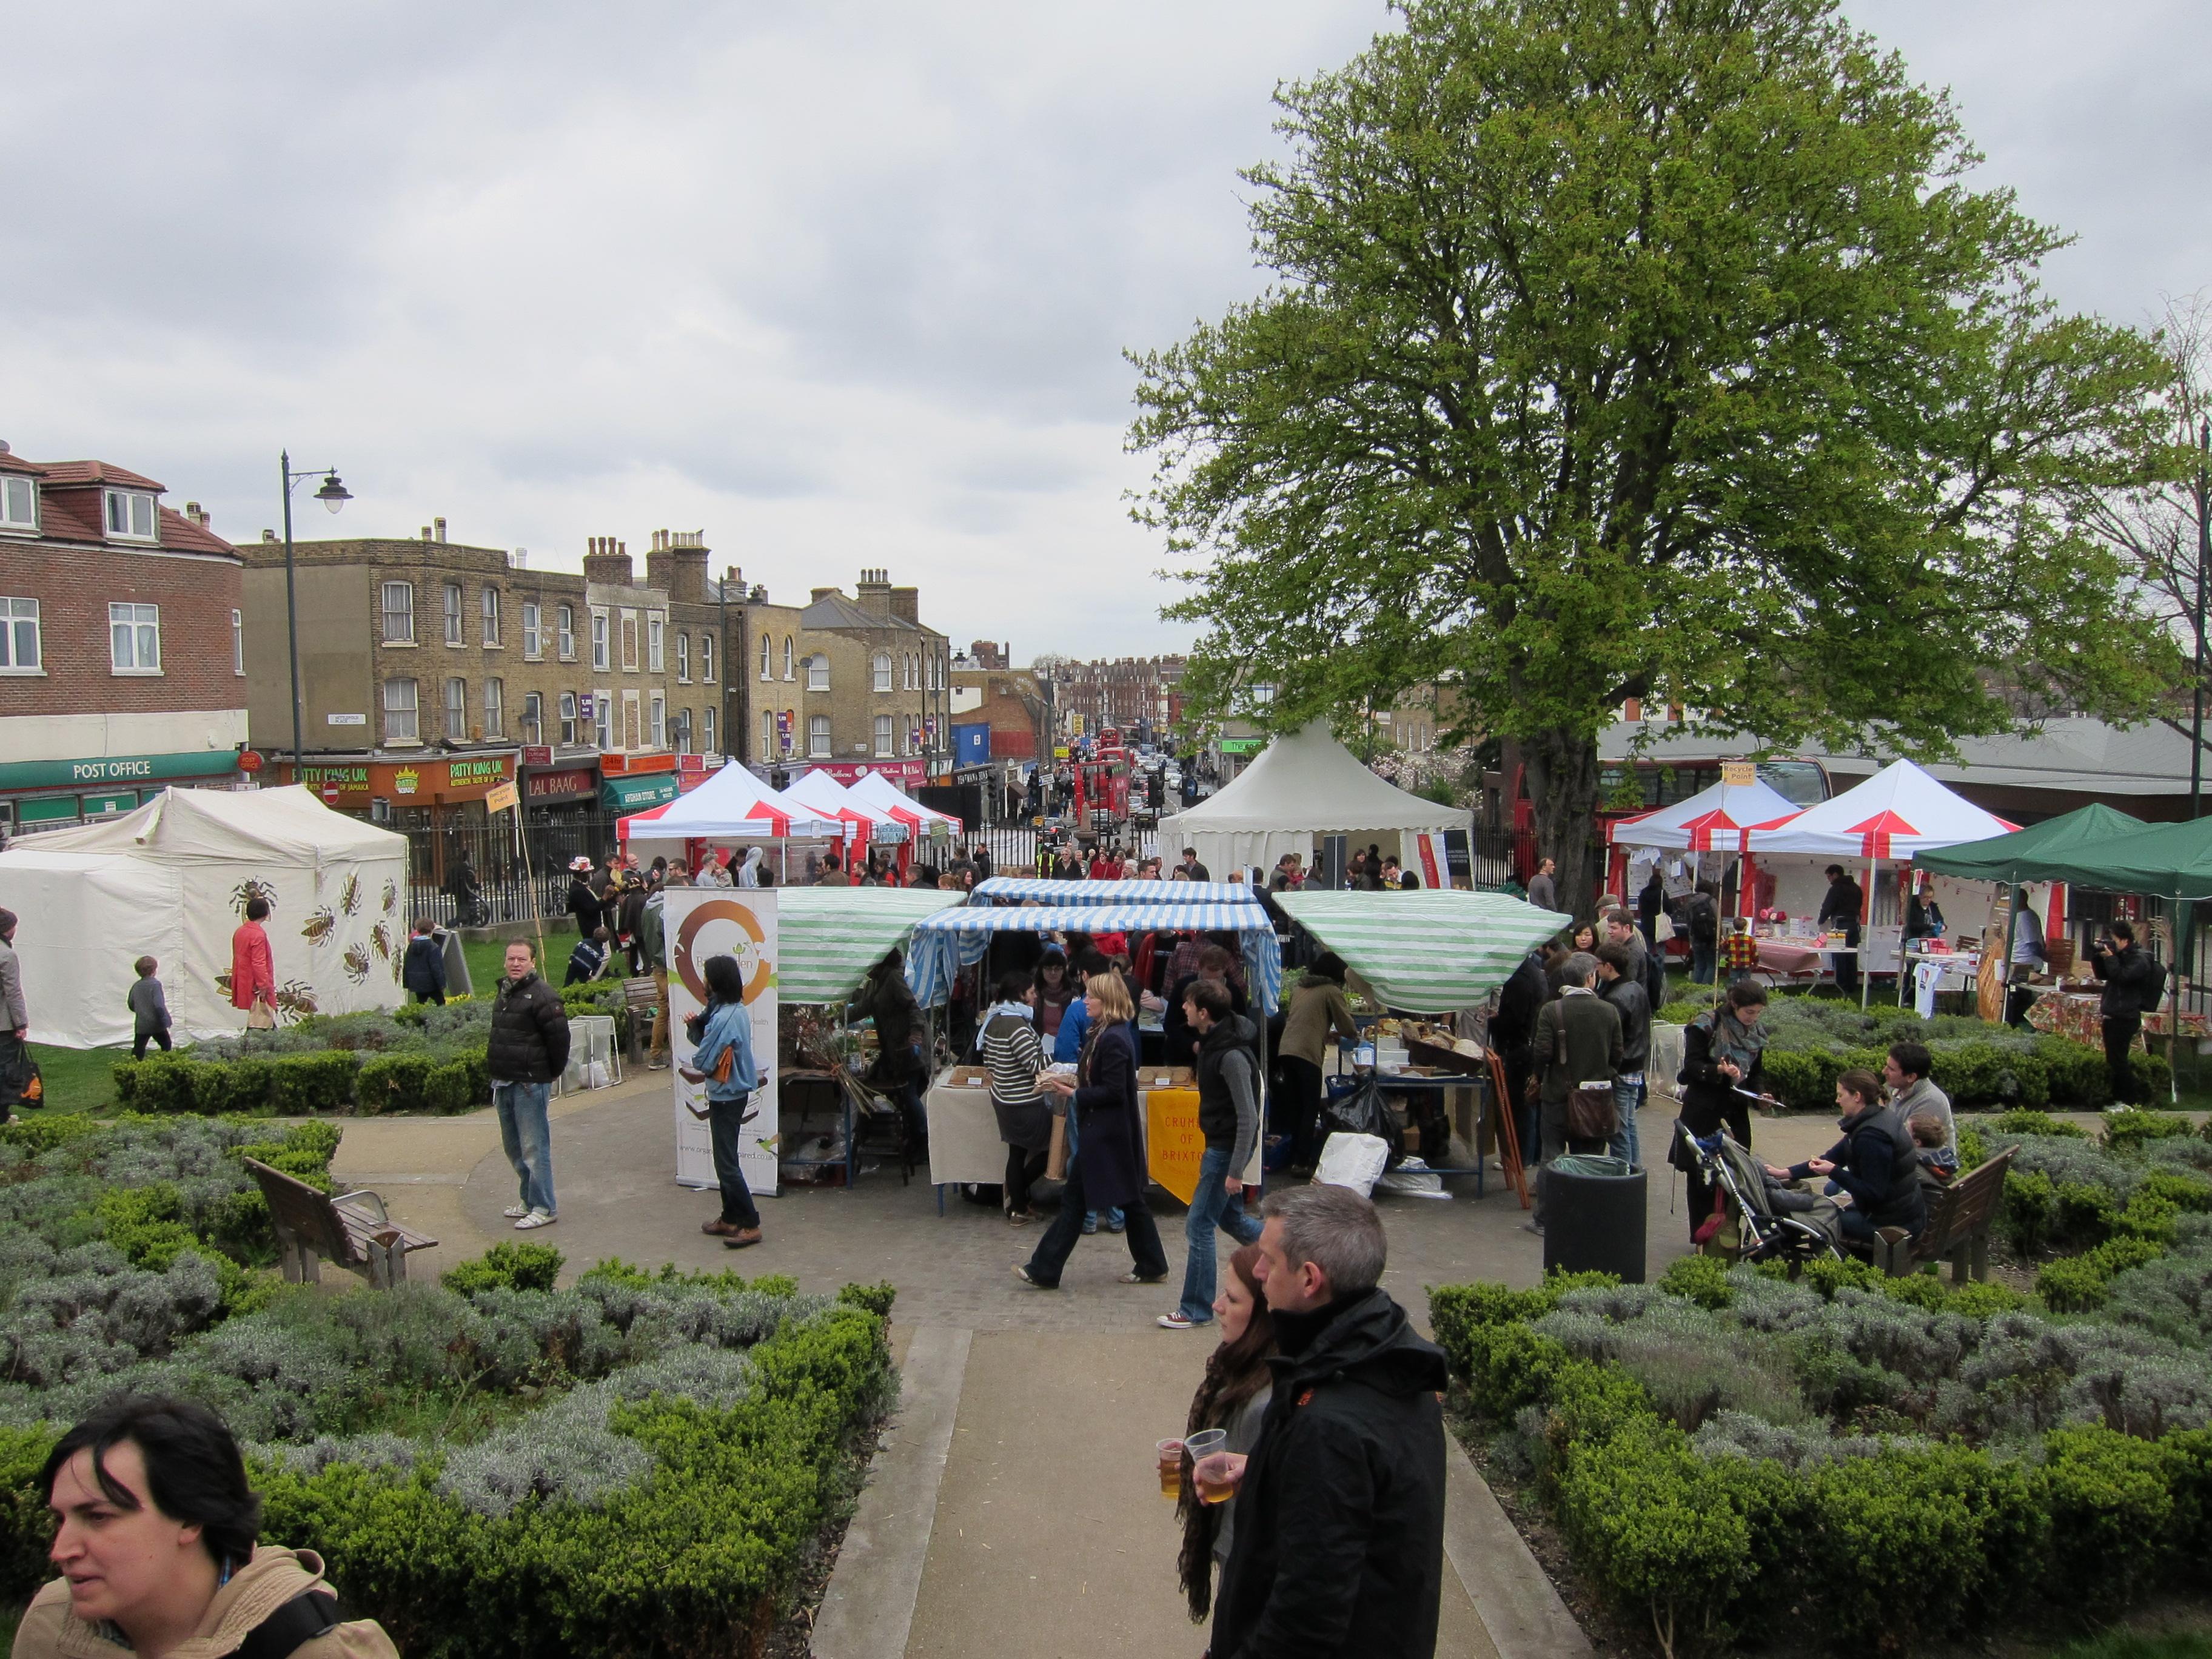 West Norwood Slow Food Festival